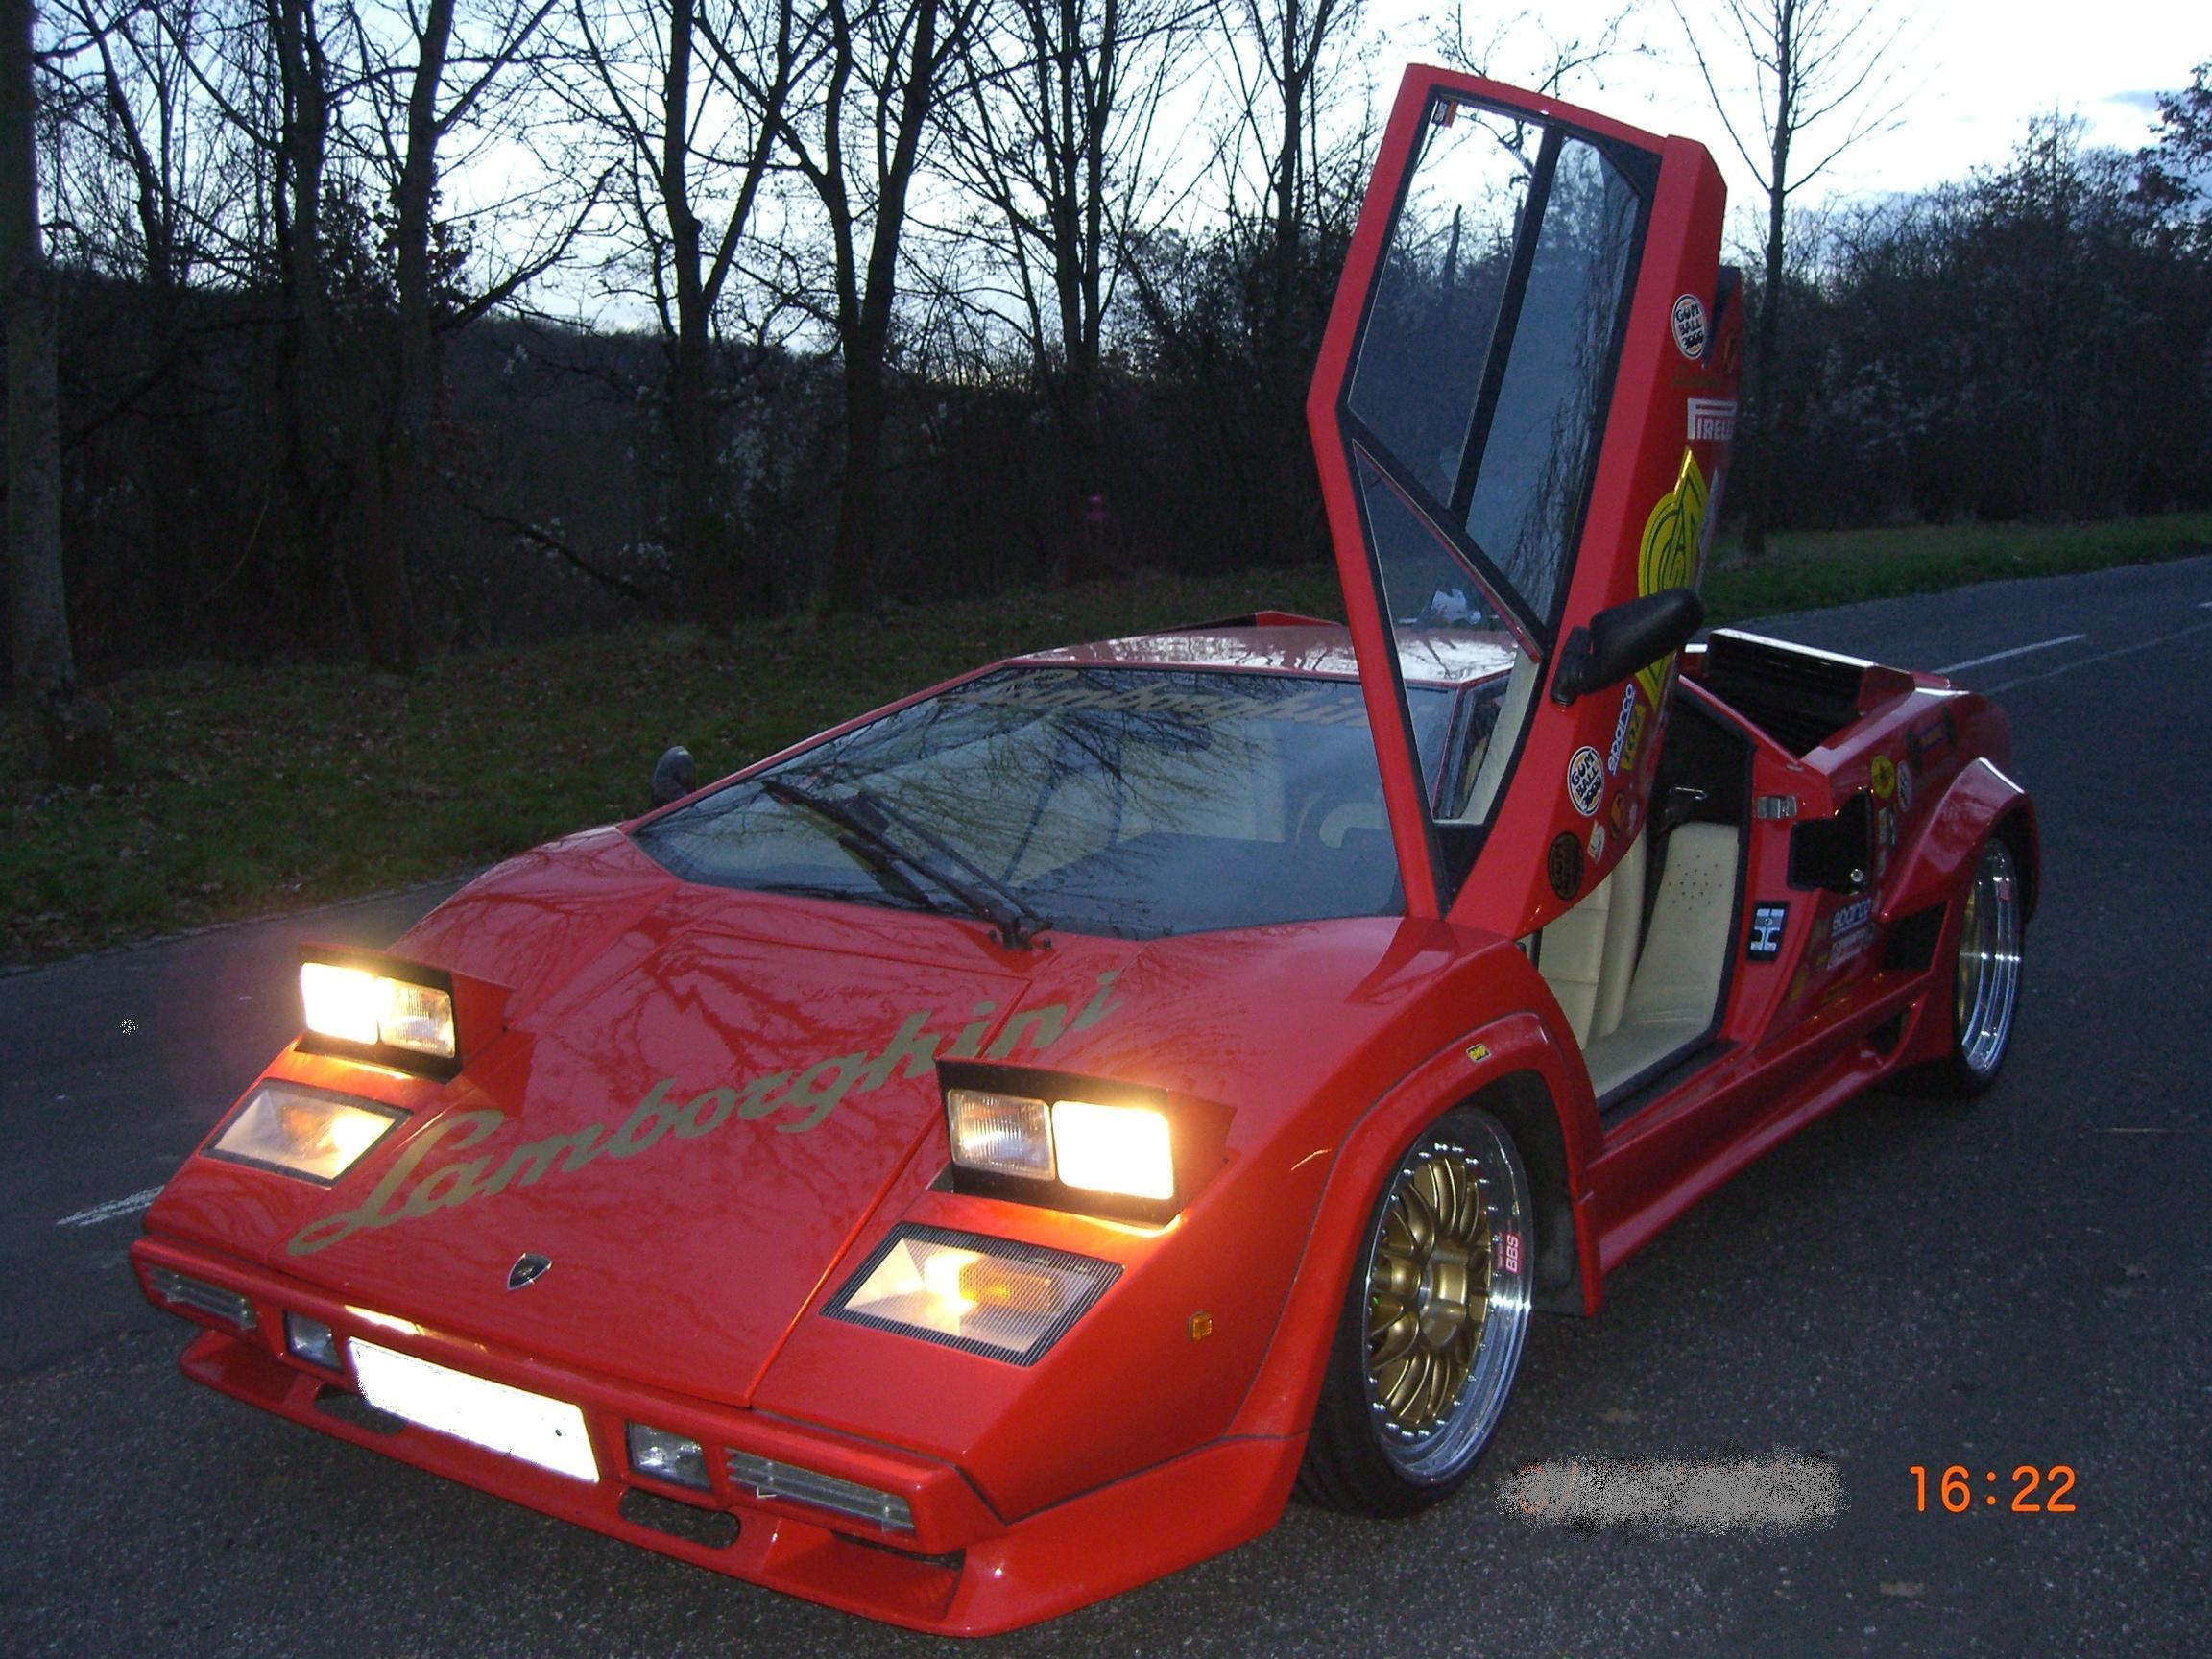 strohm%20f%C3%BCr%20222 Wonderful Lamborghini Countach Strohm De Rella Cars Trend